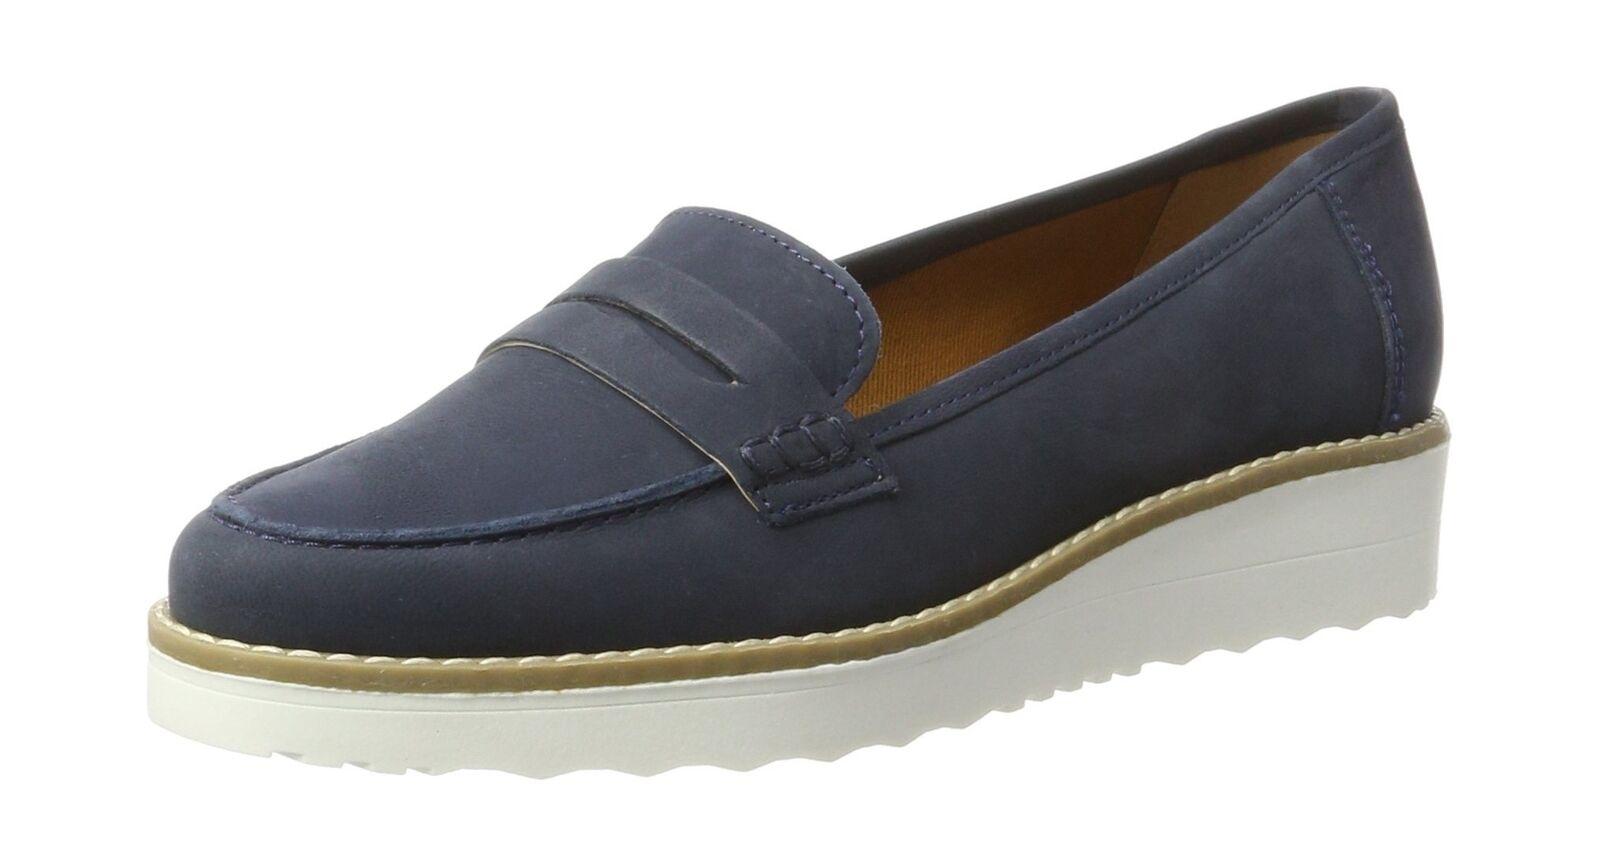 Carvela damen''s damen''s damen''s Mile Loafers Blau (Navy) 4 UK 56f087